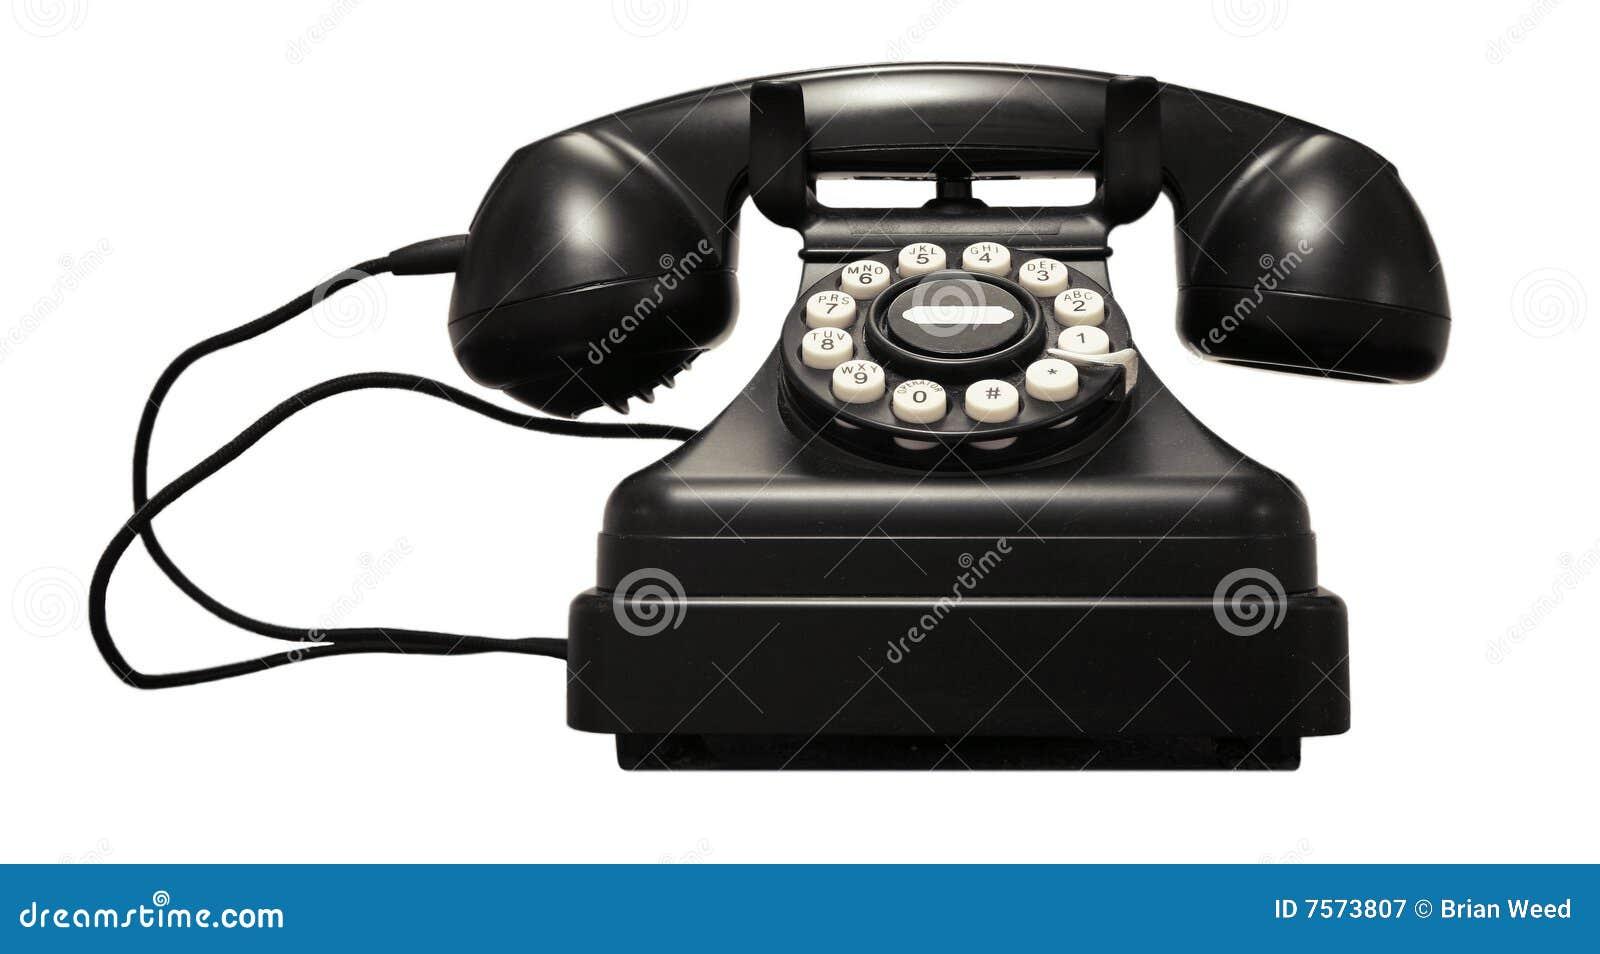 vintage telephone royalty free stock photography image 7573807. Black Bedroom Furniture Sets. Home Design Ideas